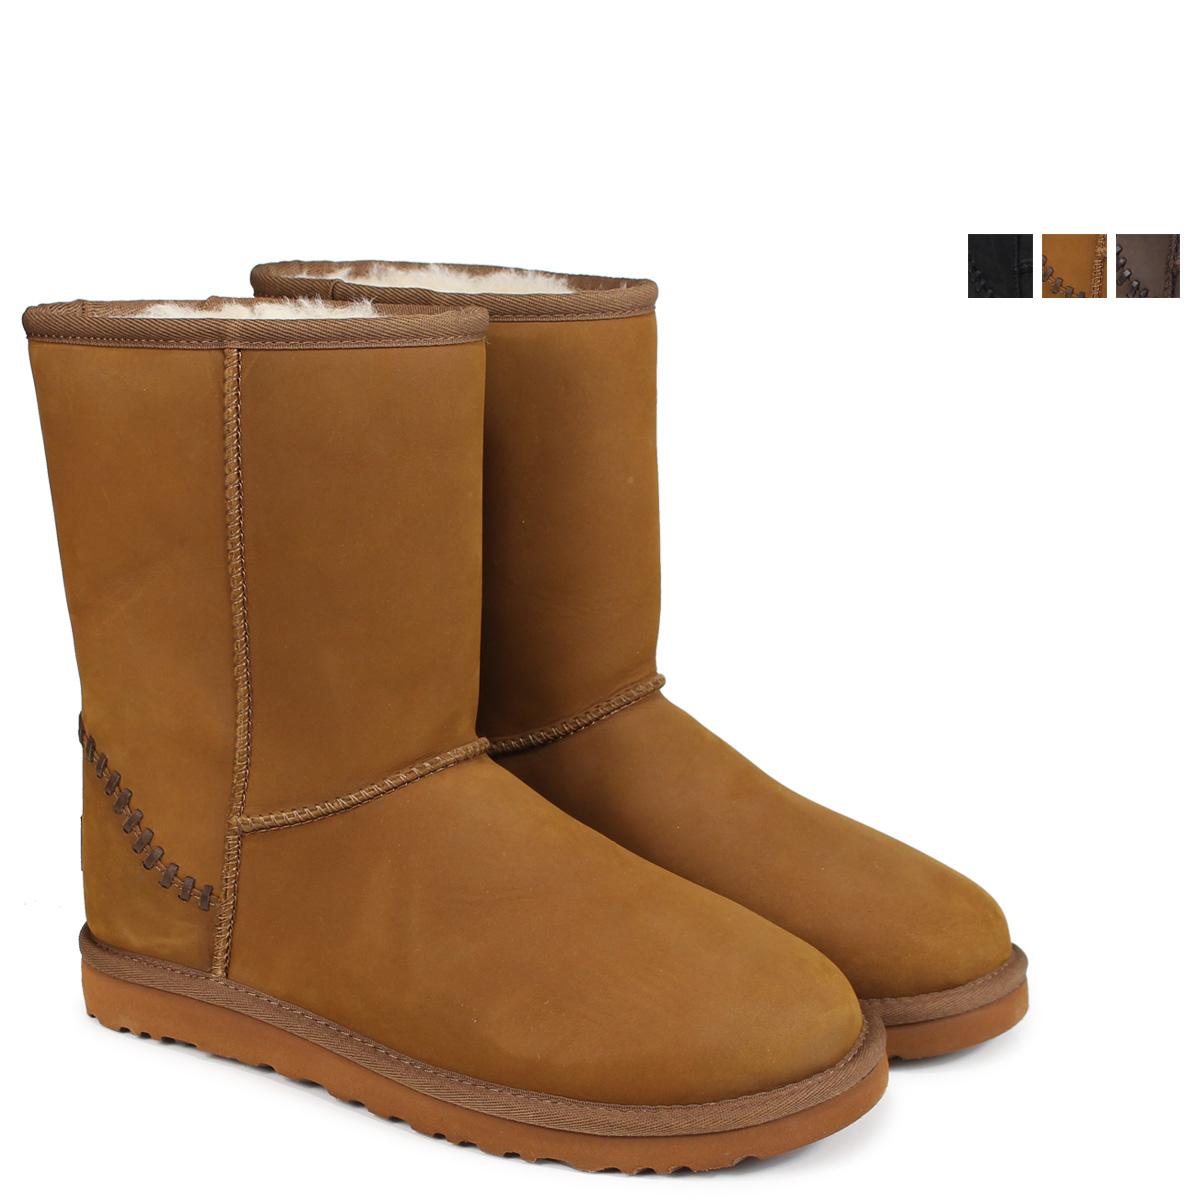 2a2df2e89c2 アグ UGG men classical music short mouton boots MENS CLASSIC SHORT DECO  1007307 sheepskin